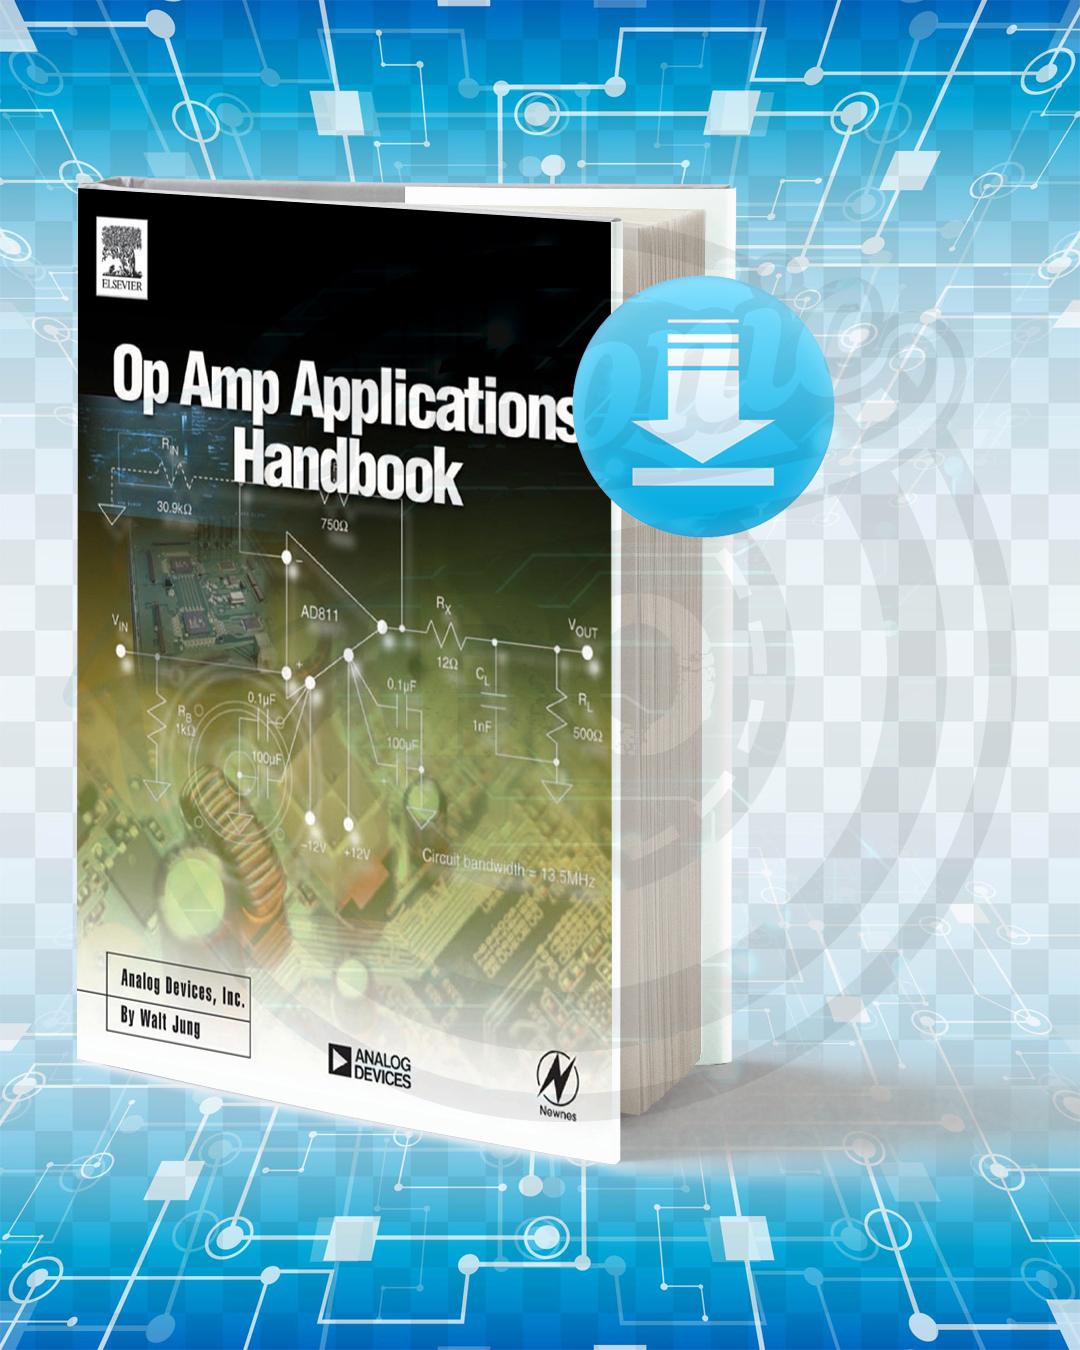 Download Op Amp Applications Handbook pdf.